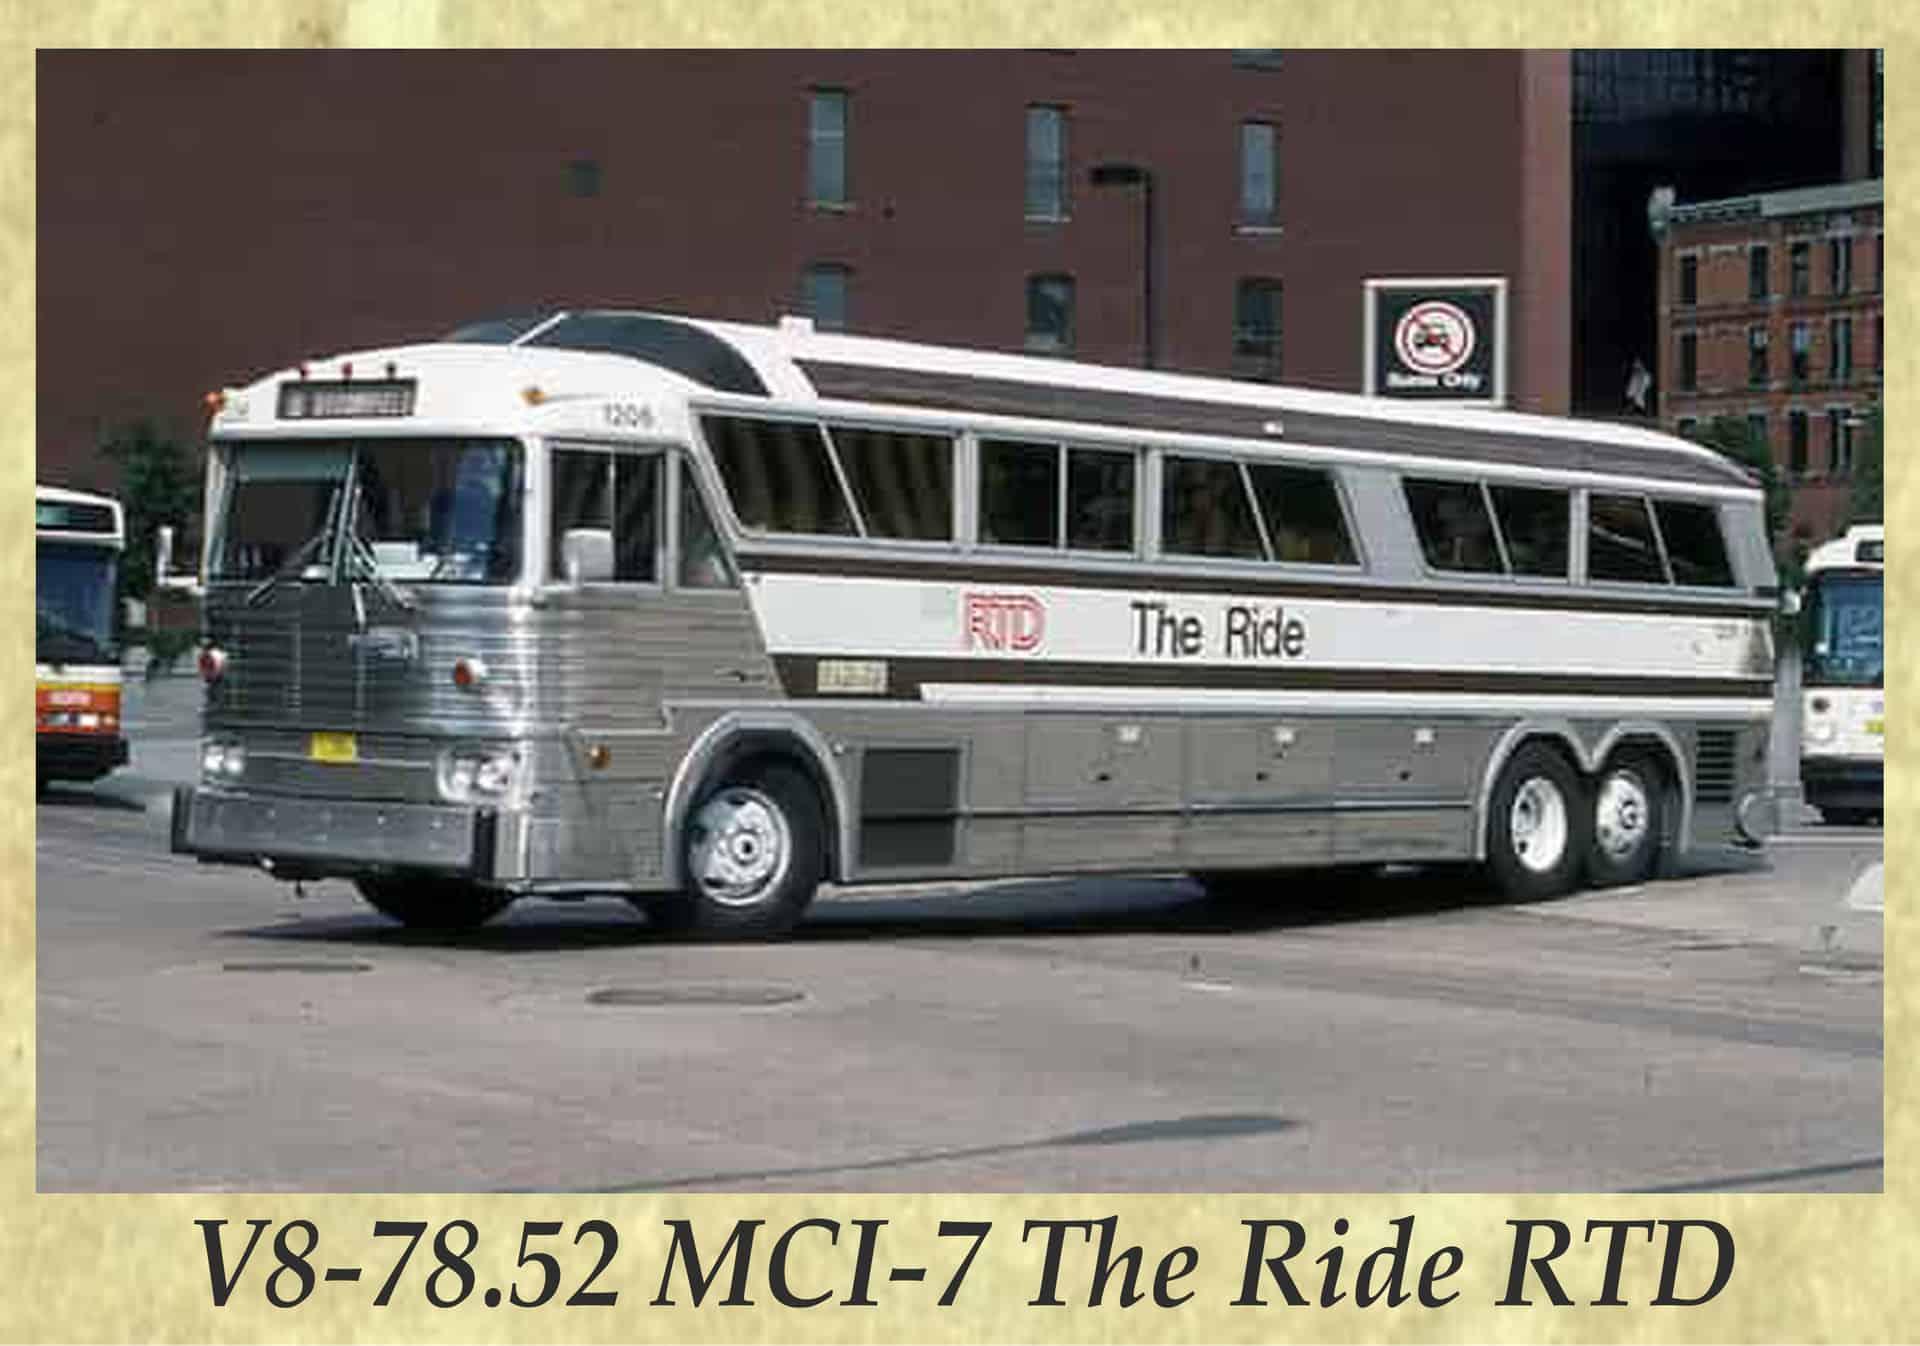 V8-78.52 MCI-7 The Ride RTD